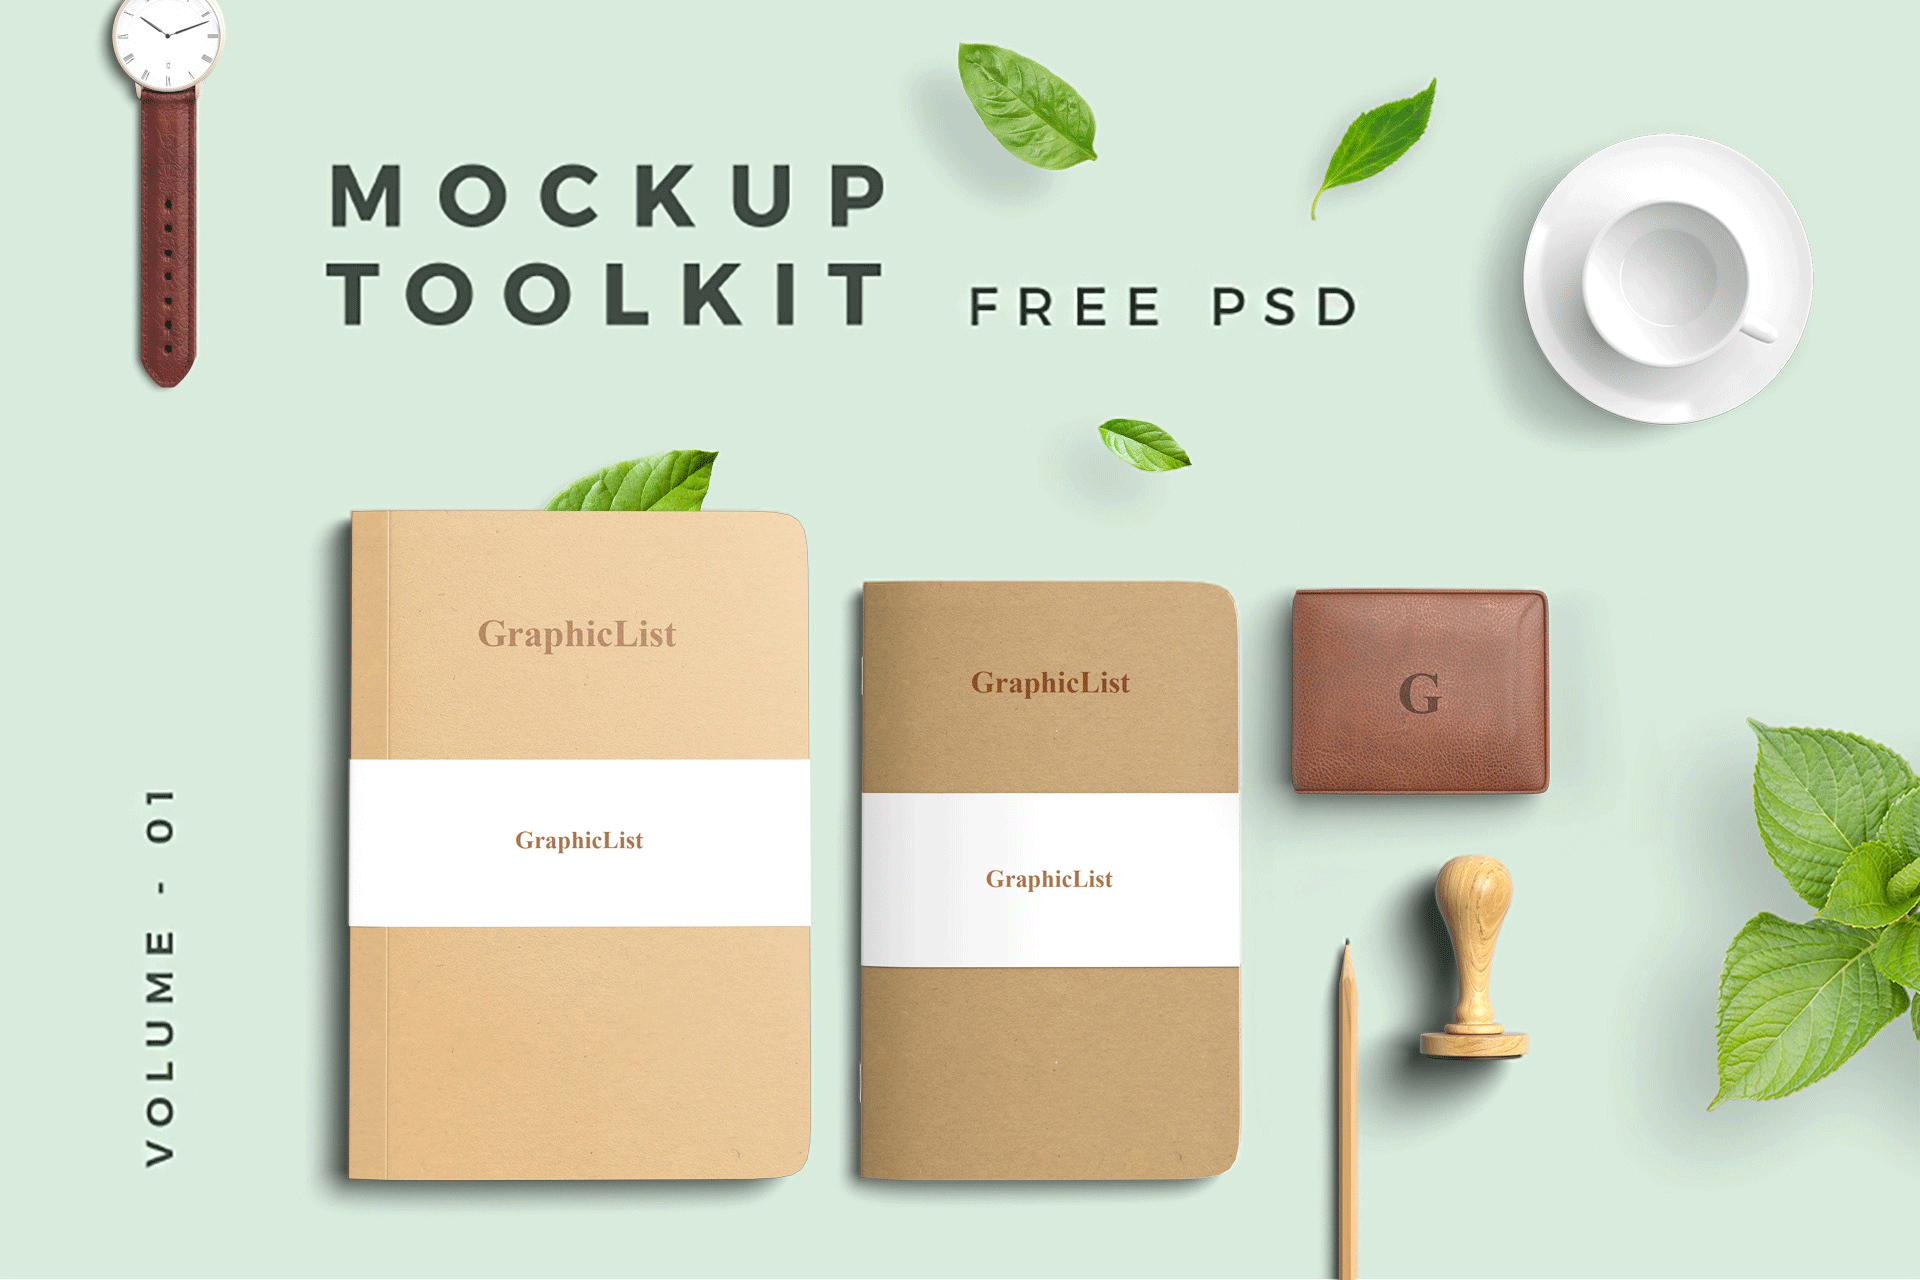 VI设计提案信封名片展示样机 Artistic Designers Mockup Toolkit Set